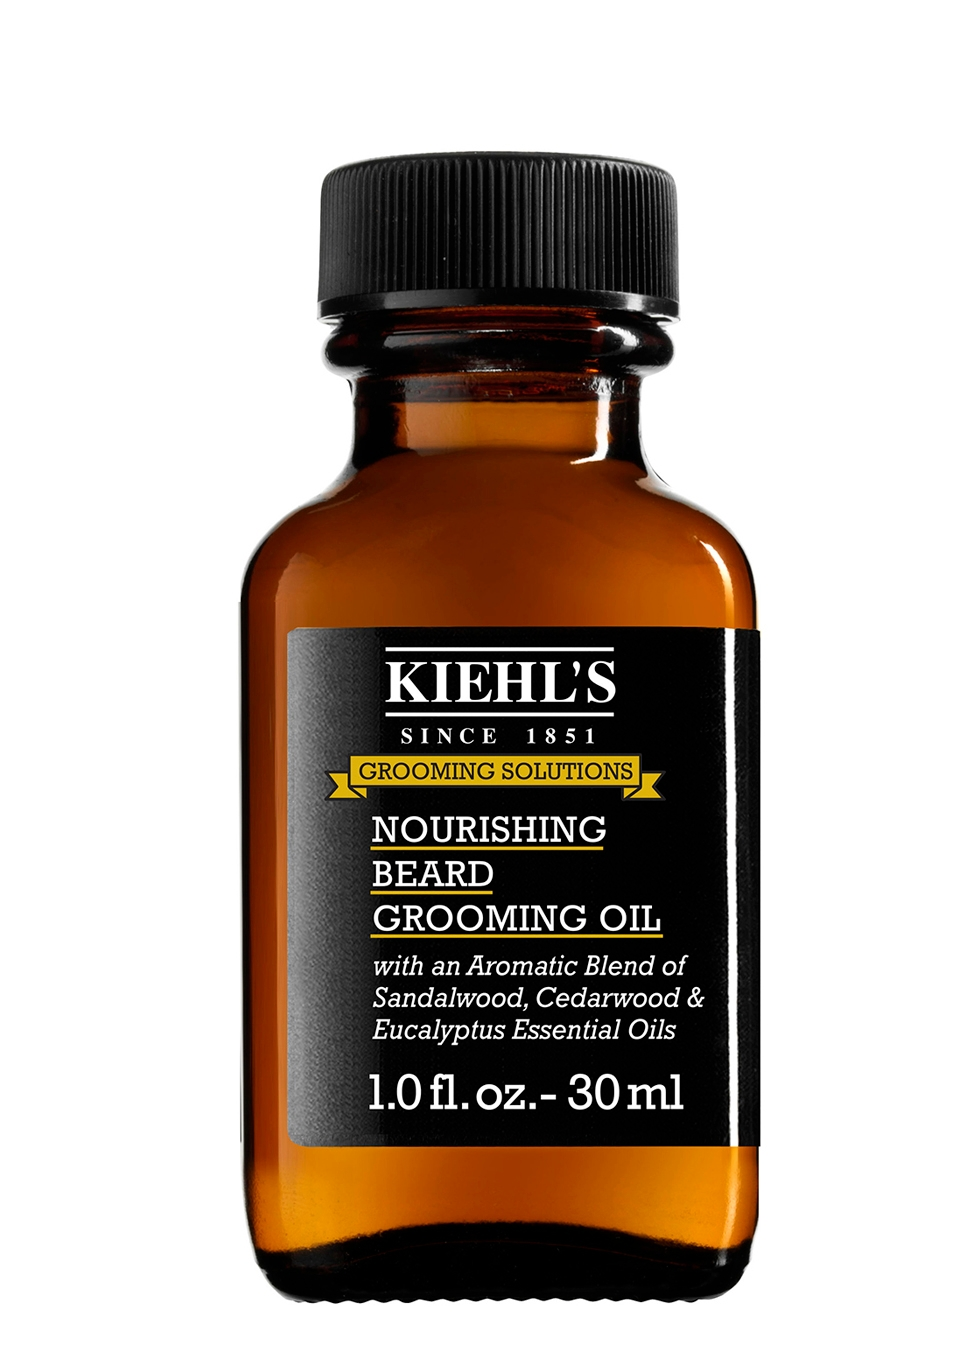 Nourishing Beard Grooming Oil 30ml